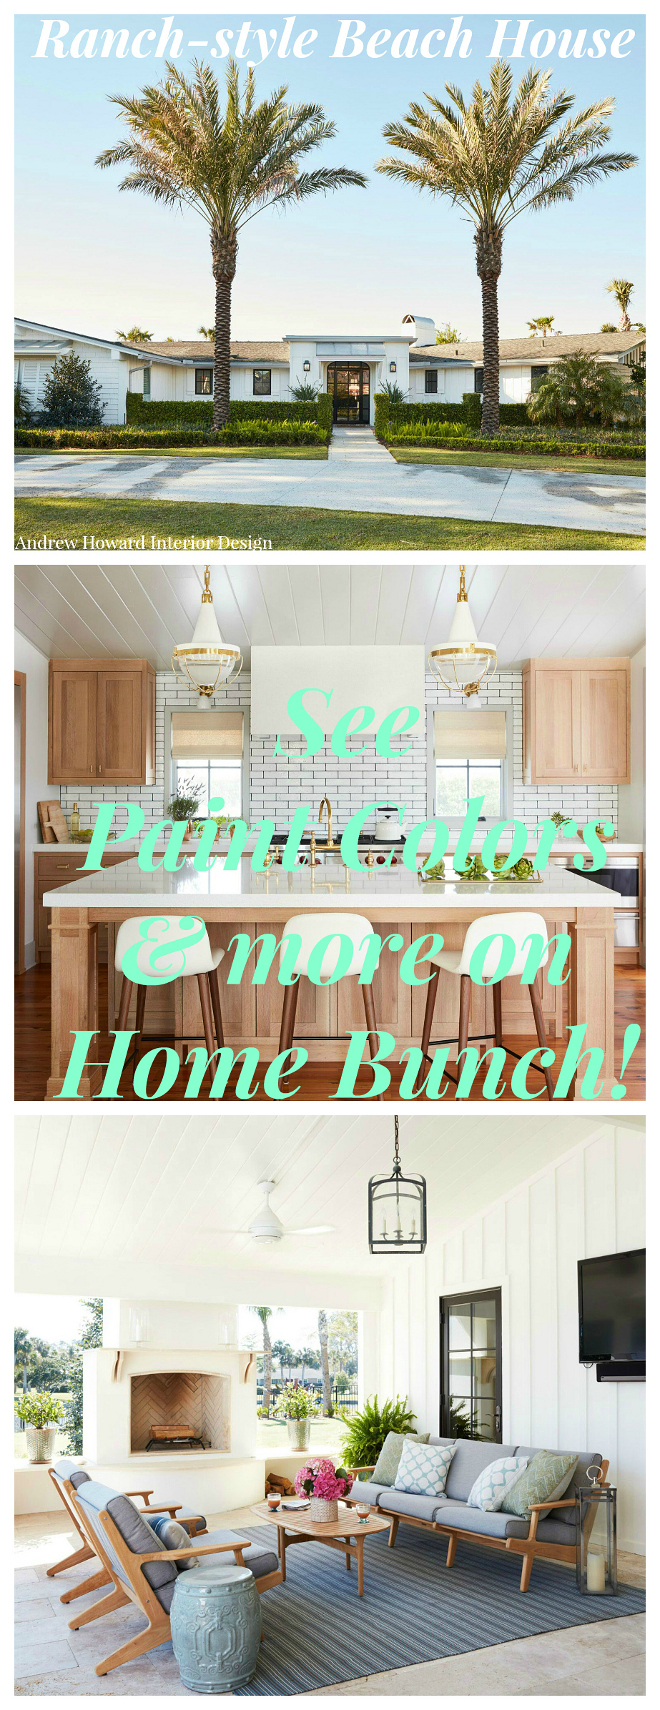 Ranch-style Beach House Interior Ideas #RanchstyleBeachHouse #InteriorIdeas on Home Bunch